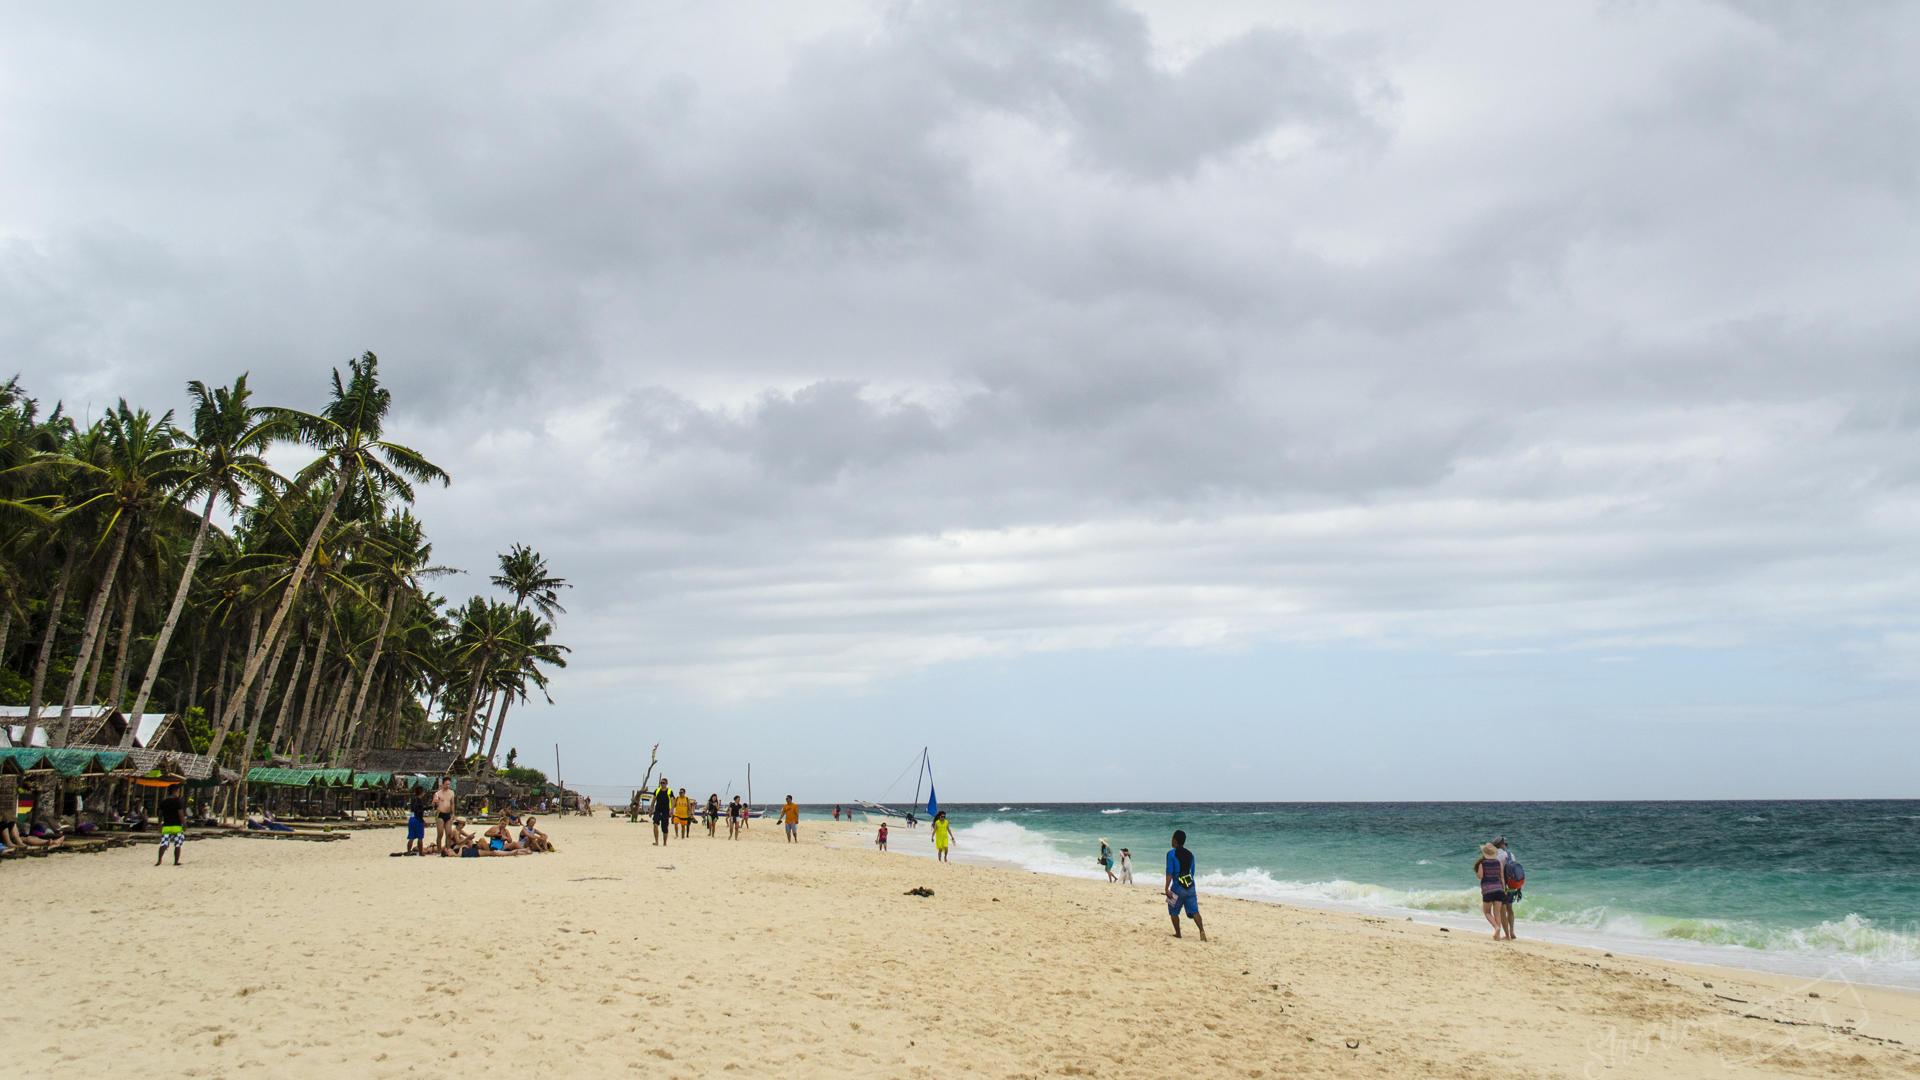 Пляж Пука, Пляж Пука боракай, боракай пука